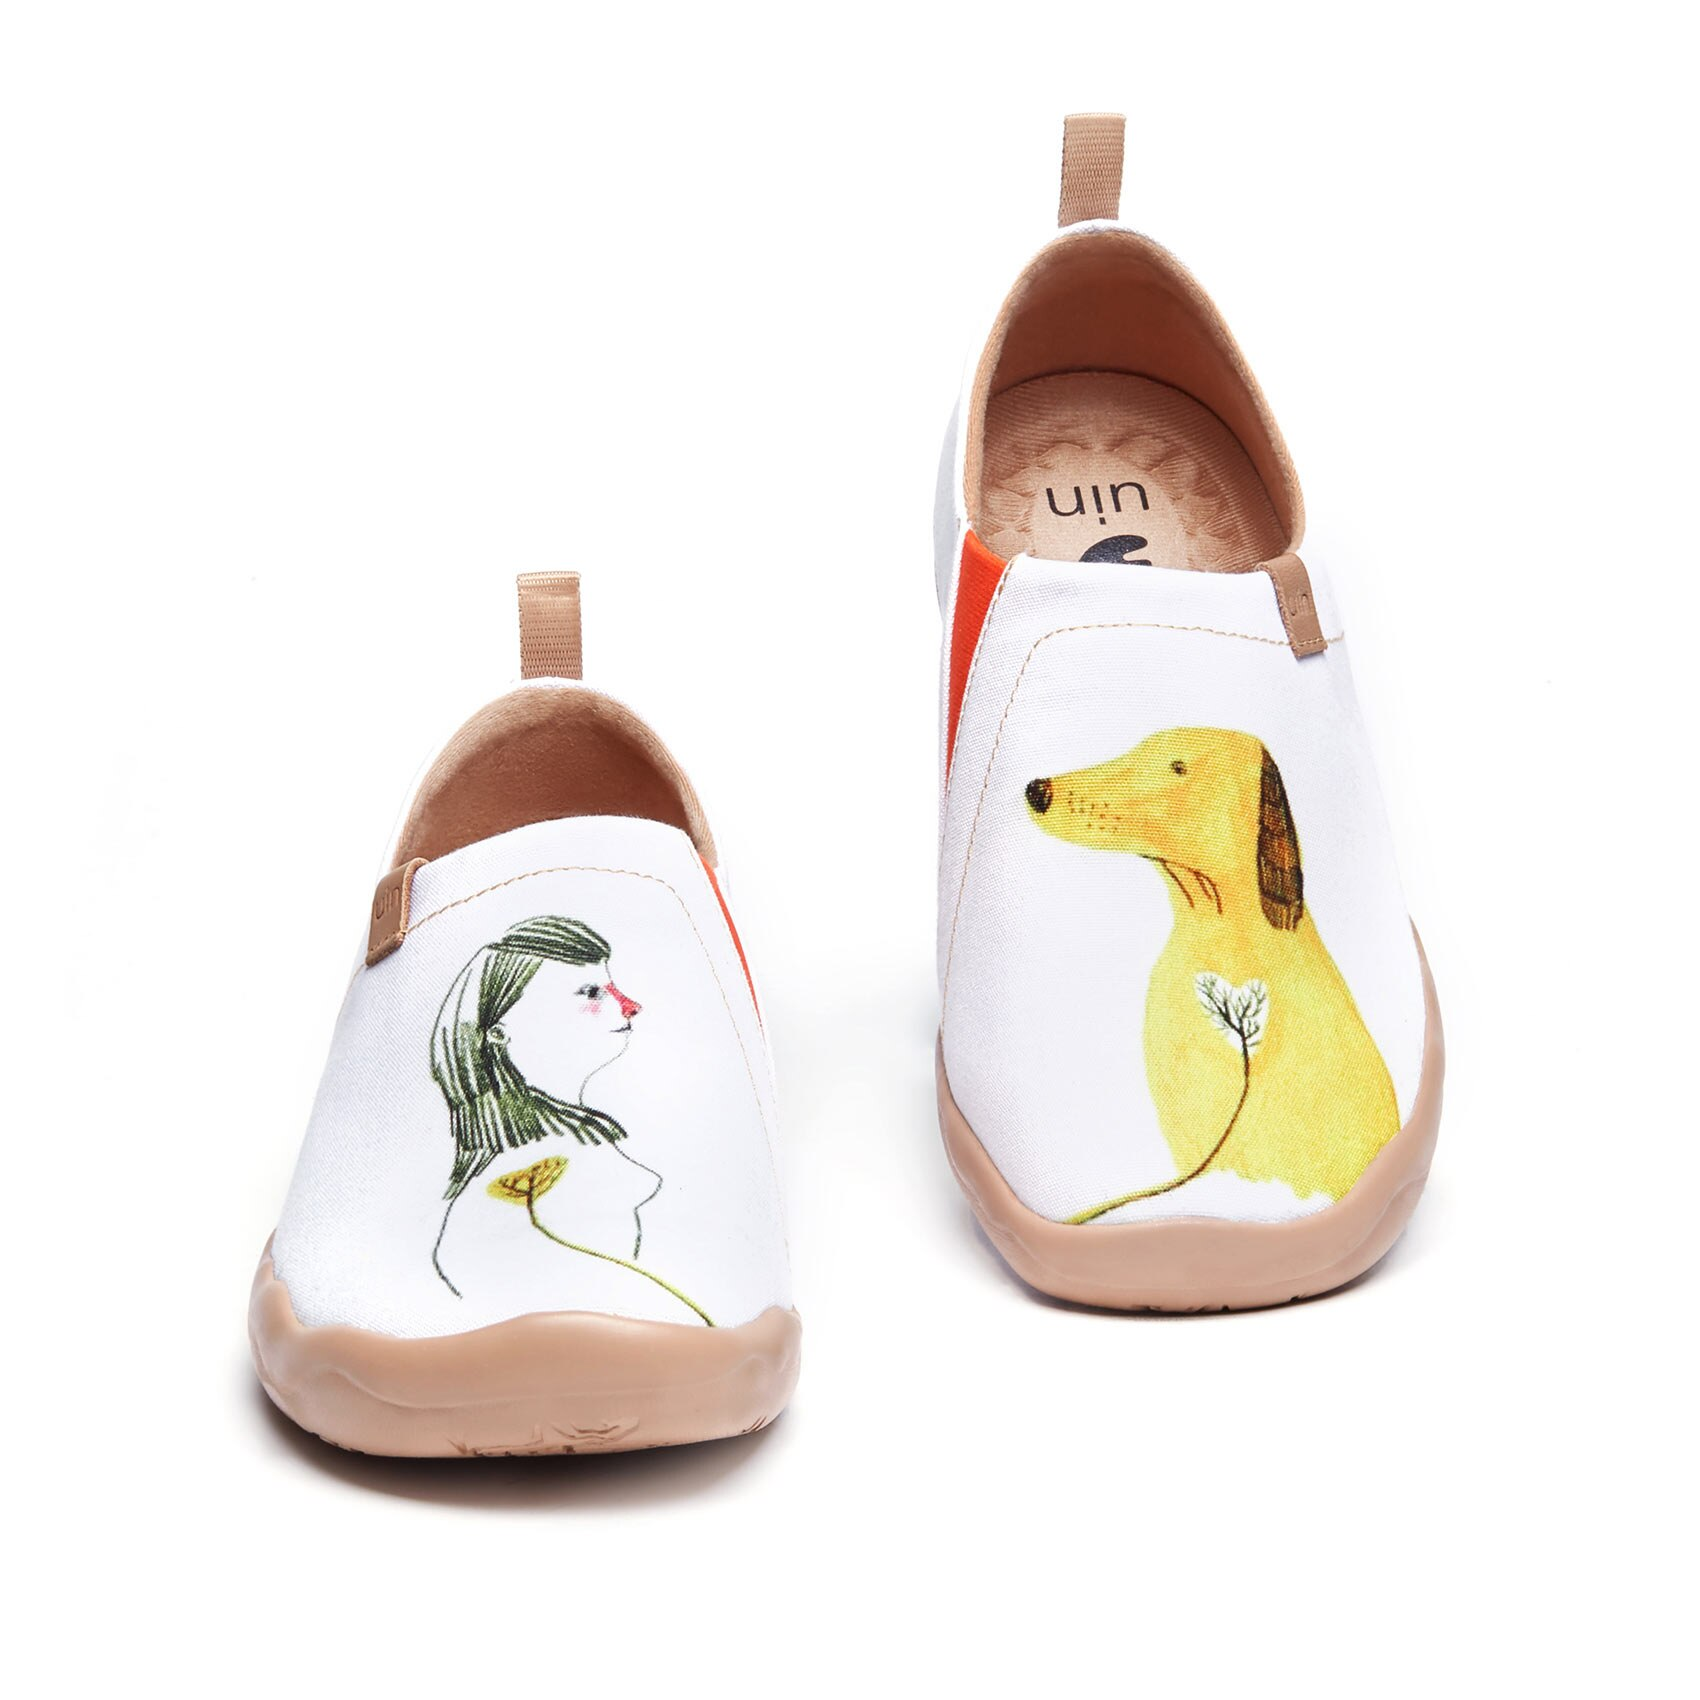 UIN-أحذية رياضية نسائية خفيفة الوزن سهلة الارتداء ، أحذية مشي ، أحذية سفر ، أحذية بدون كعب لطيفة